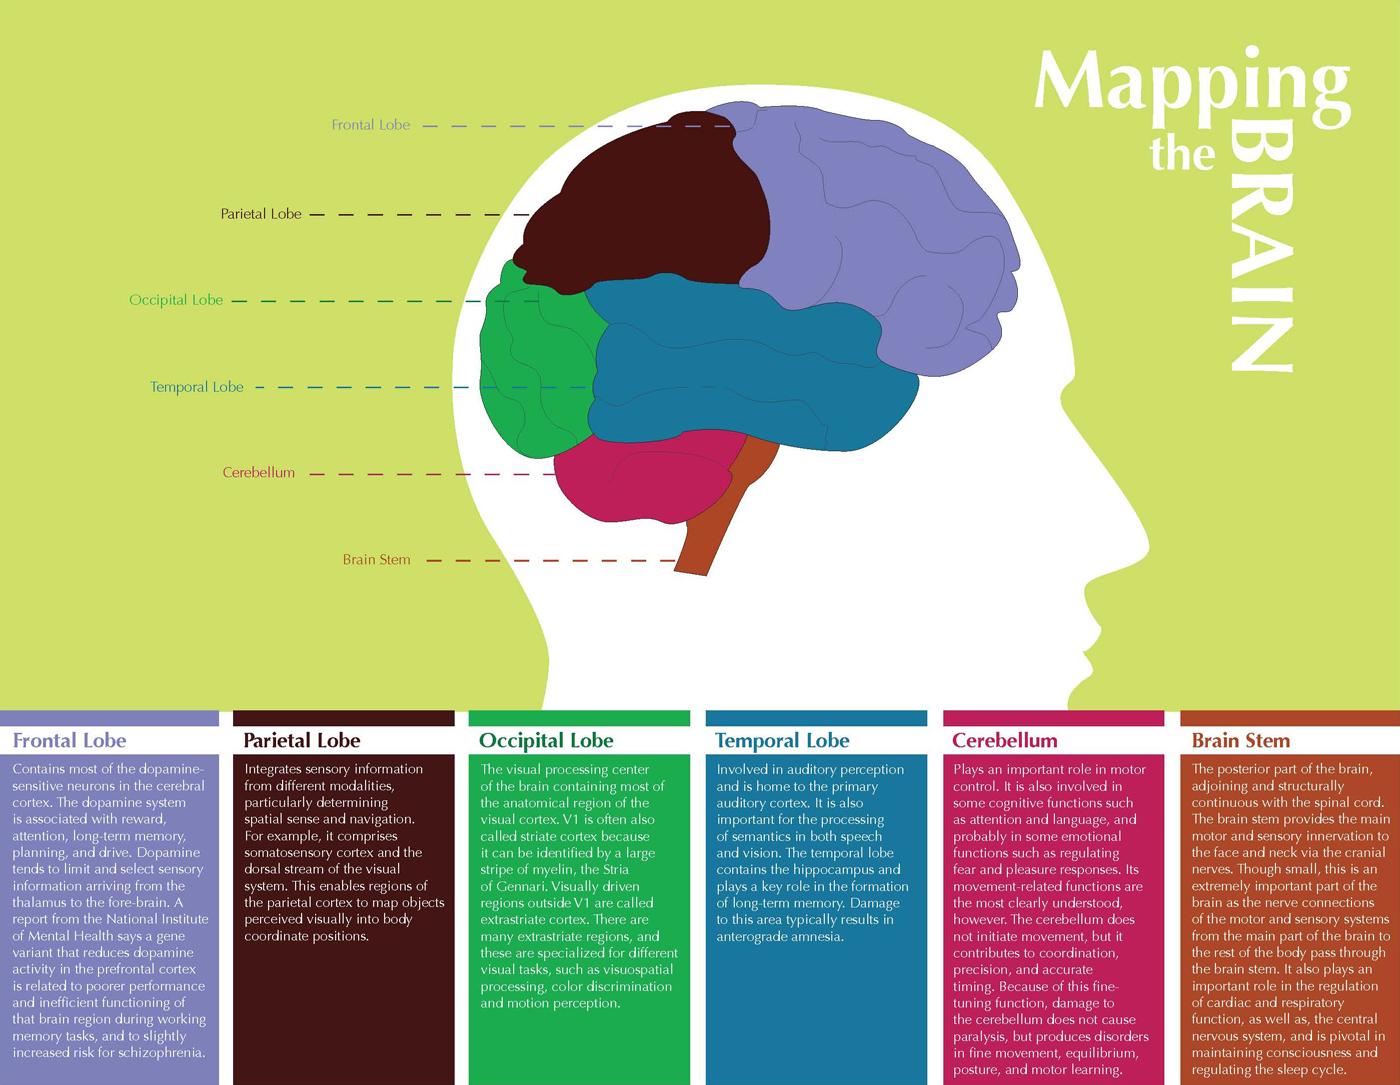 Info Graphics by Amanda Salyers at Coroflot.com